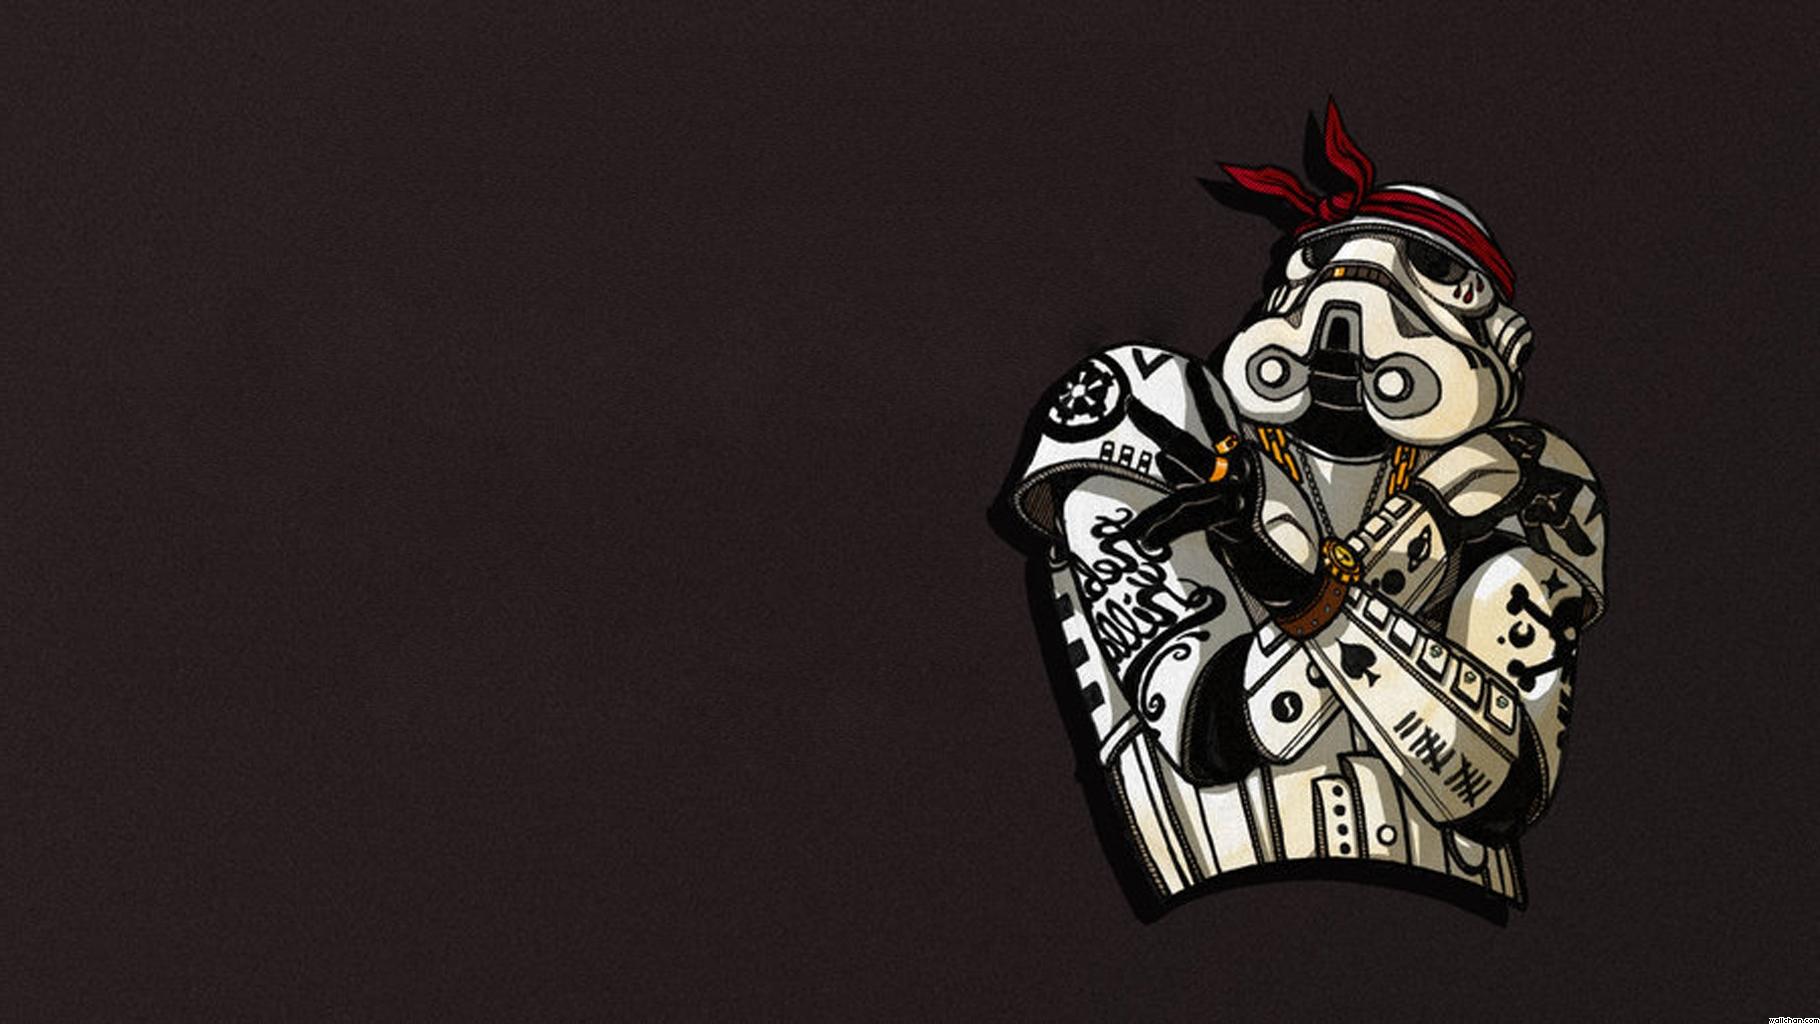 Funny Stormtrooper wallpaper